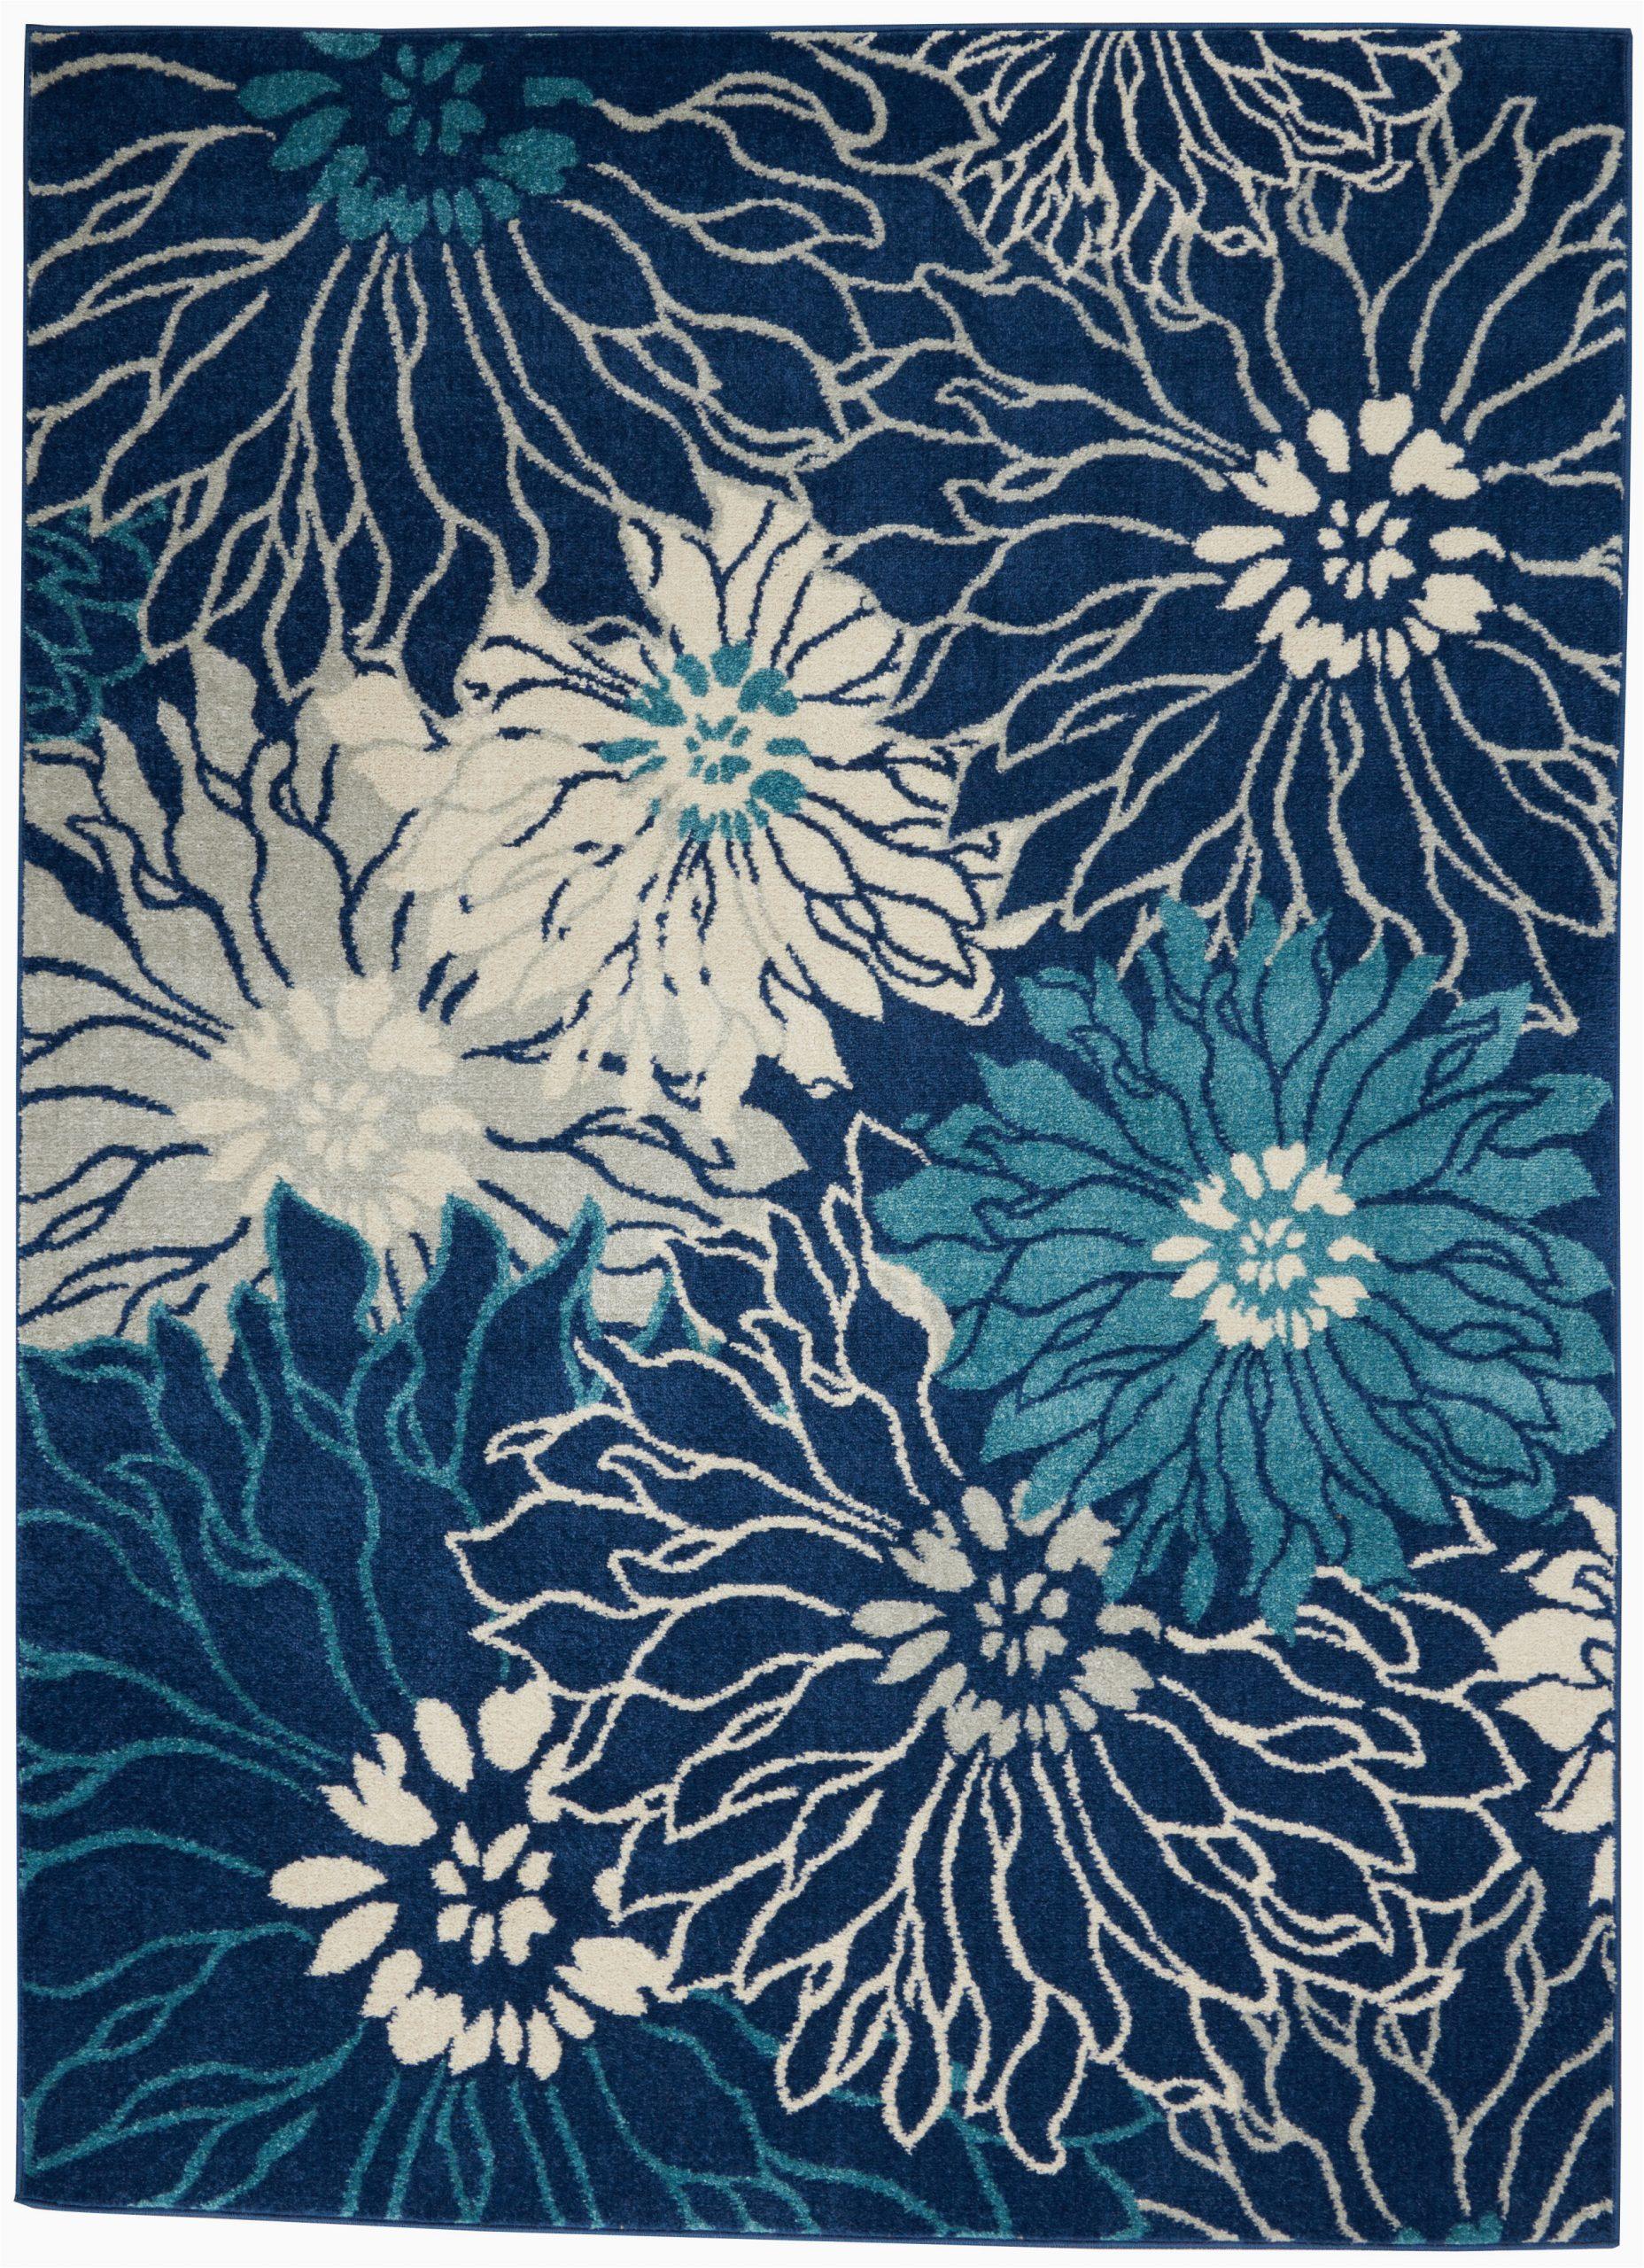 Navy Blue Floral Rug Cloutier Floral Navy Blue Ivory area Rug